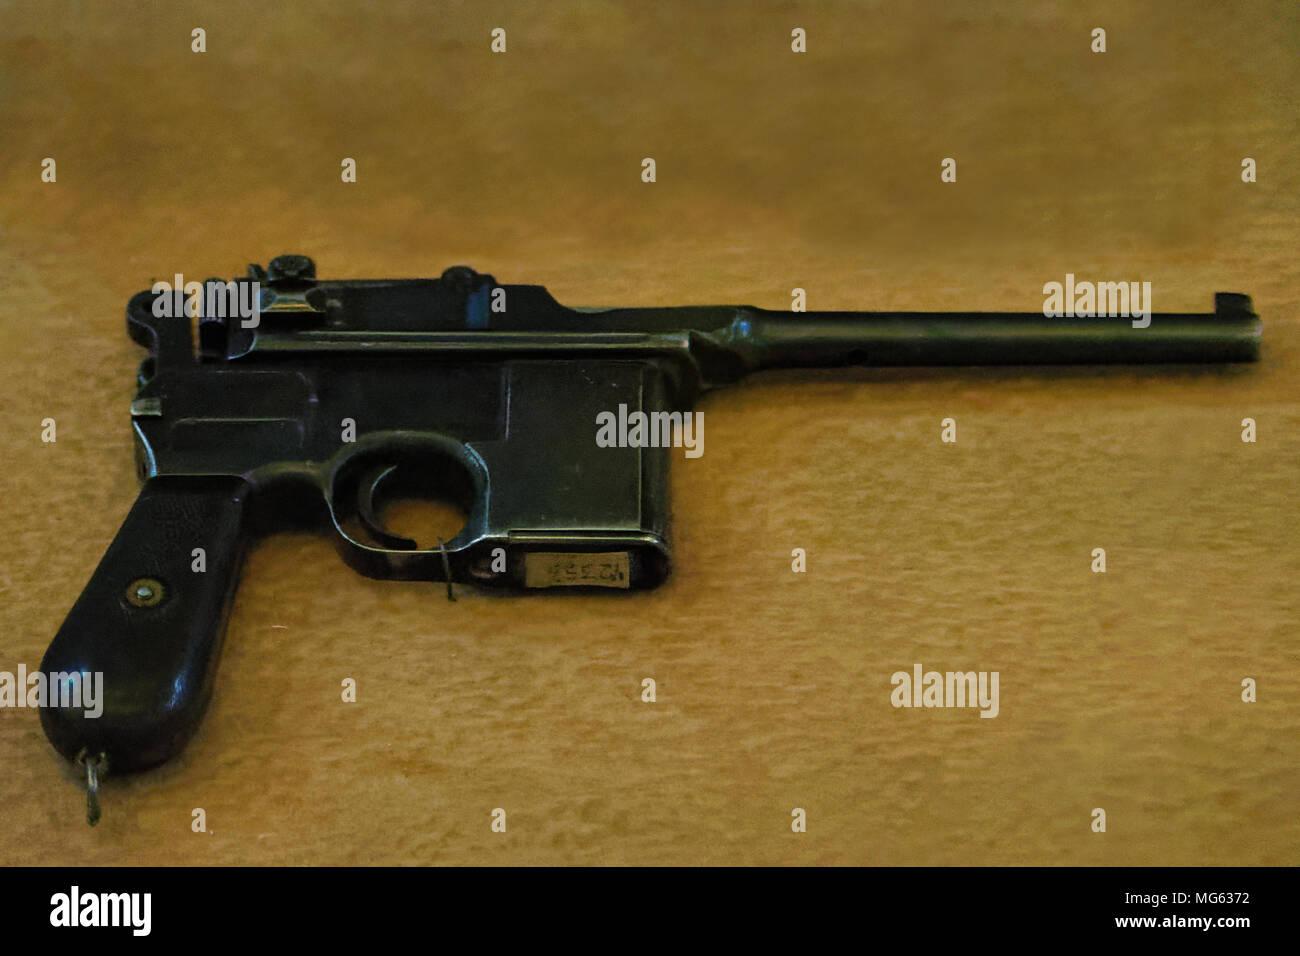 Mauser Gun Stock Photos & Mauser Gun Stock Images - Alamy